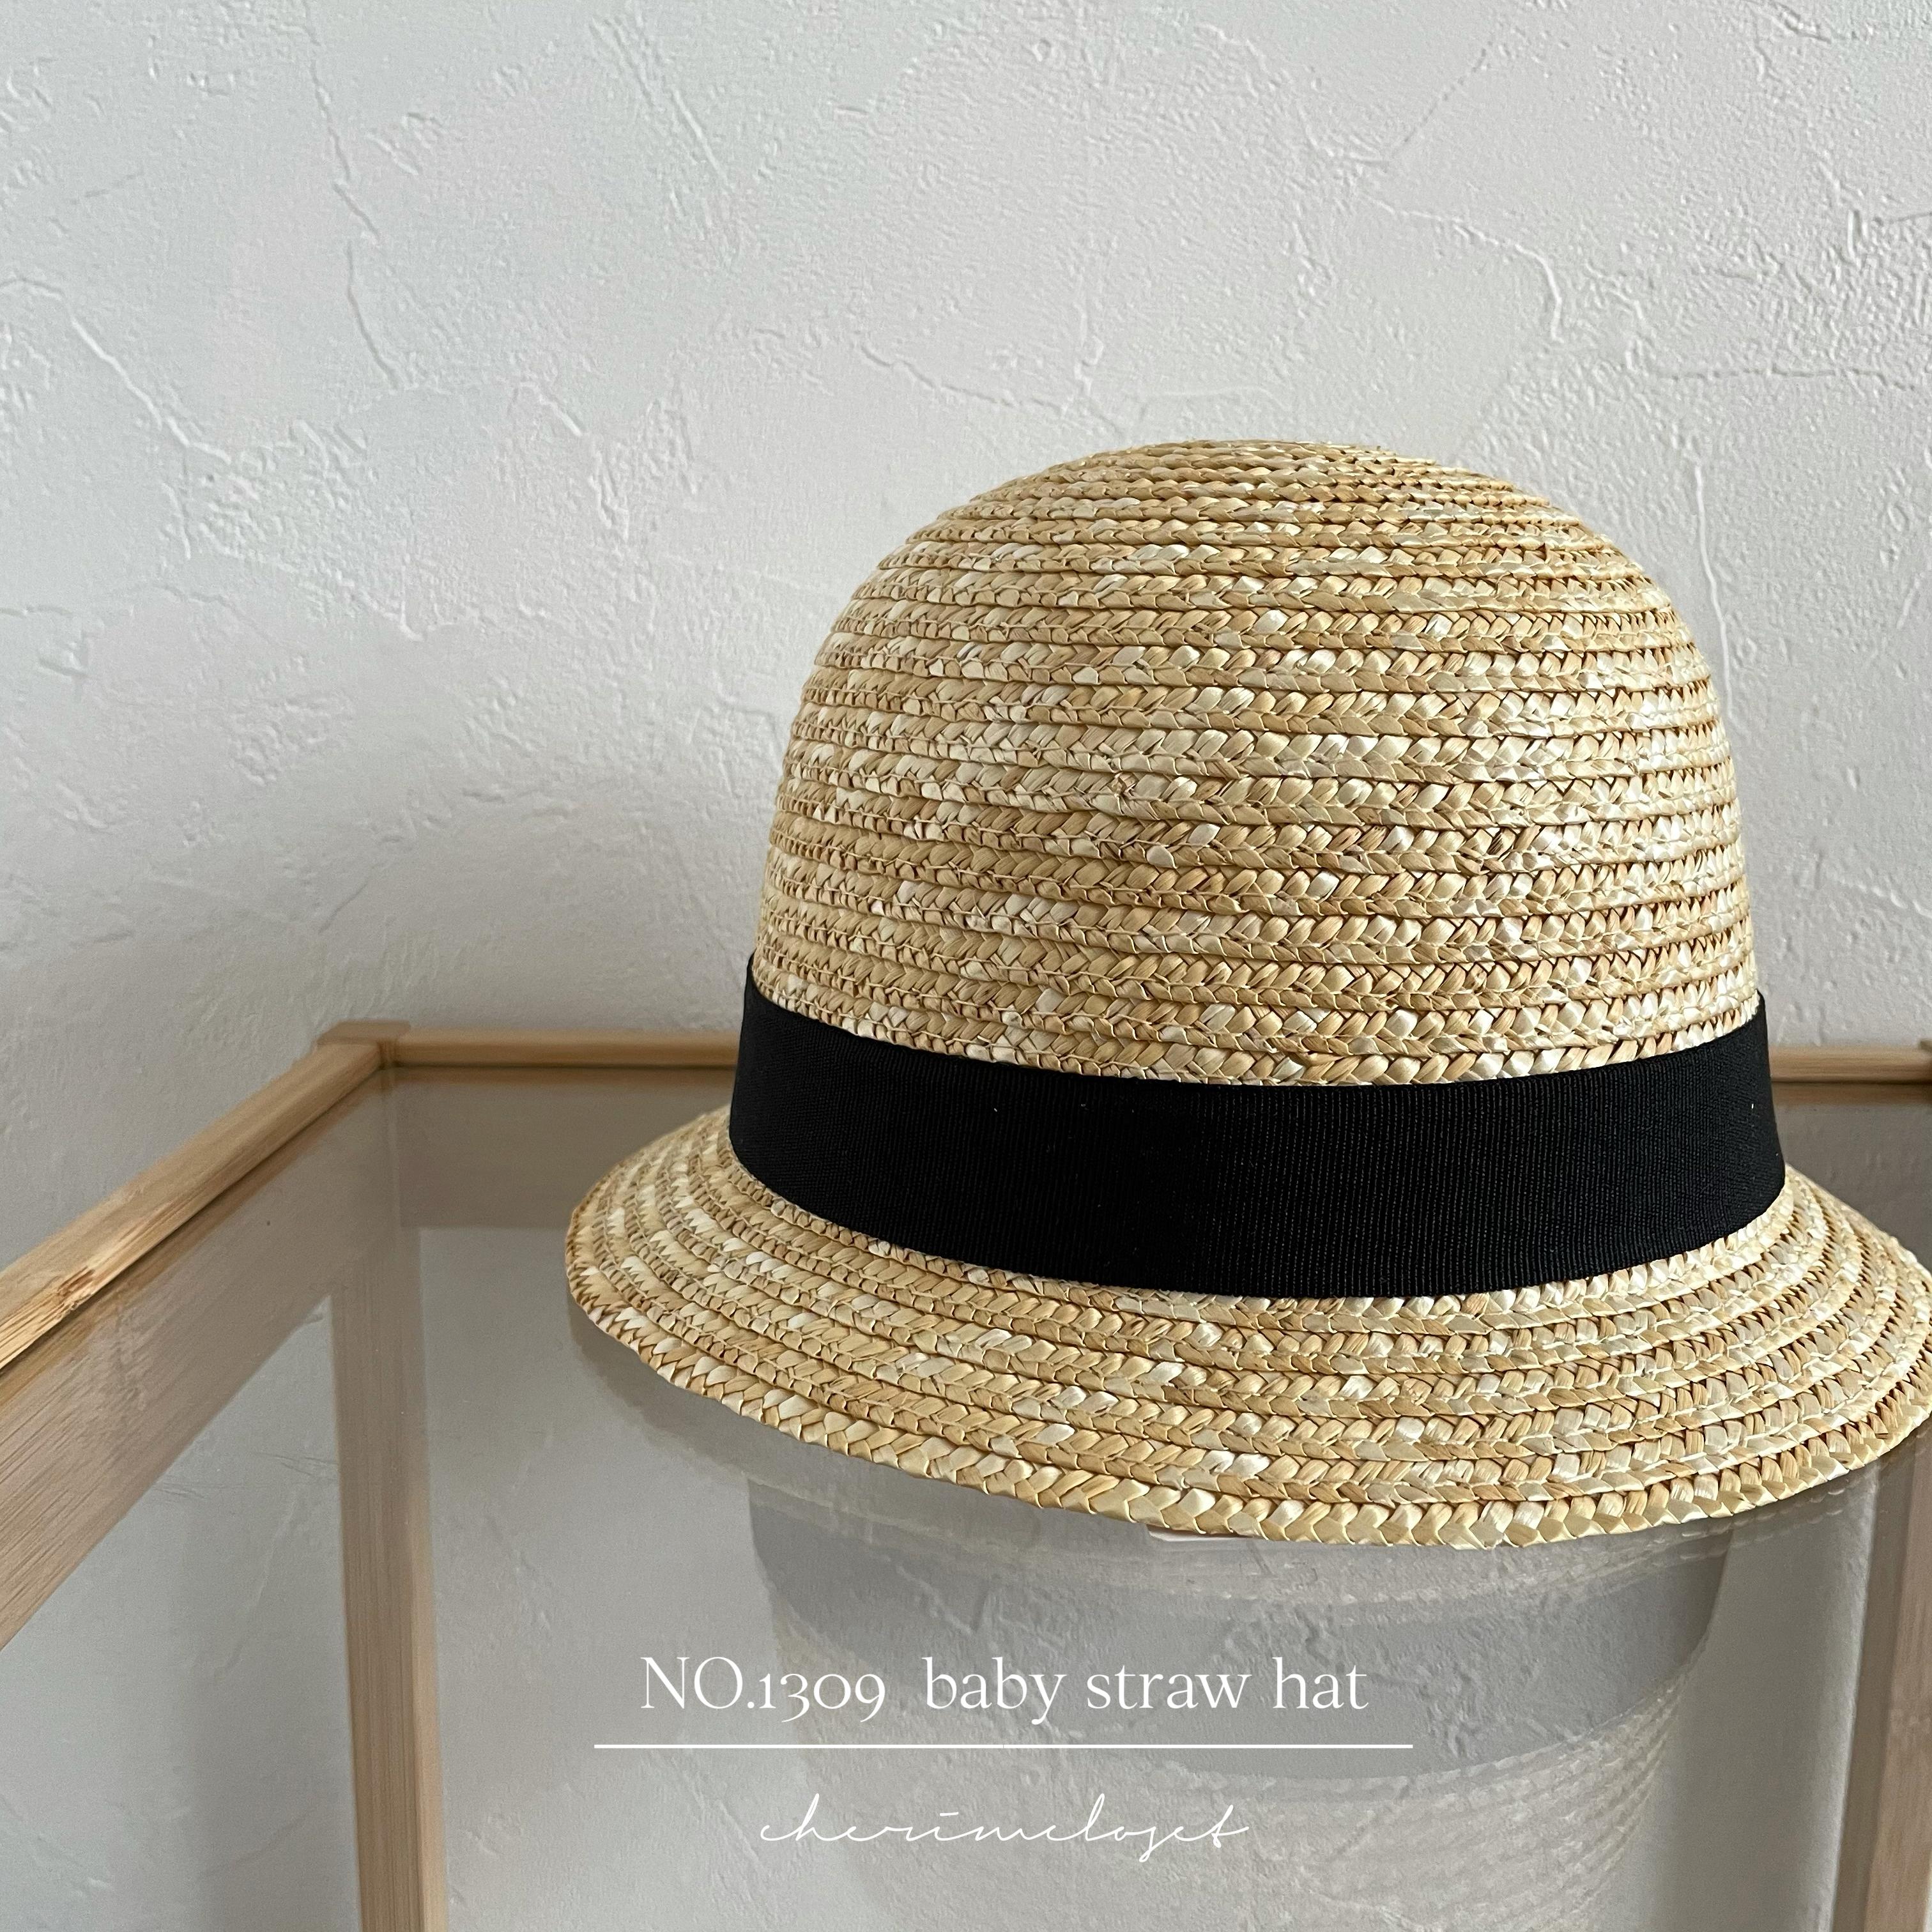 NO.1309  baby straw hat